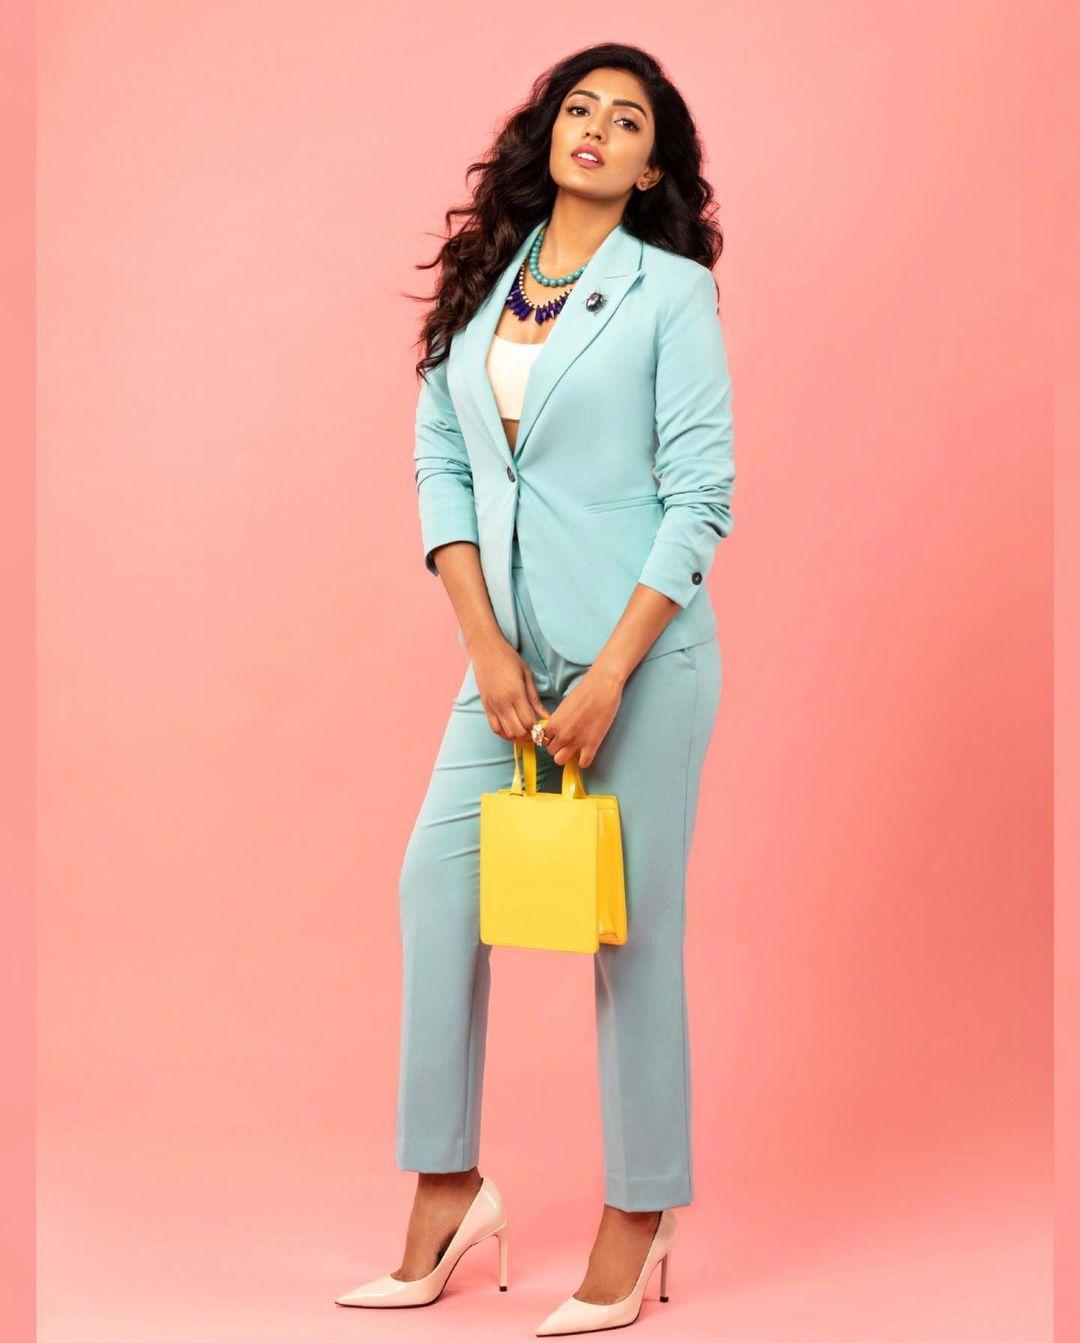 Stunning actress Eesha Reba in sky blue color pants and blazer with yellow hand bag. 2021-07-22